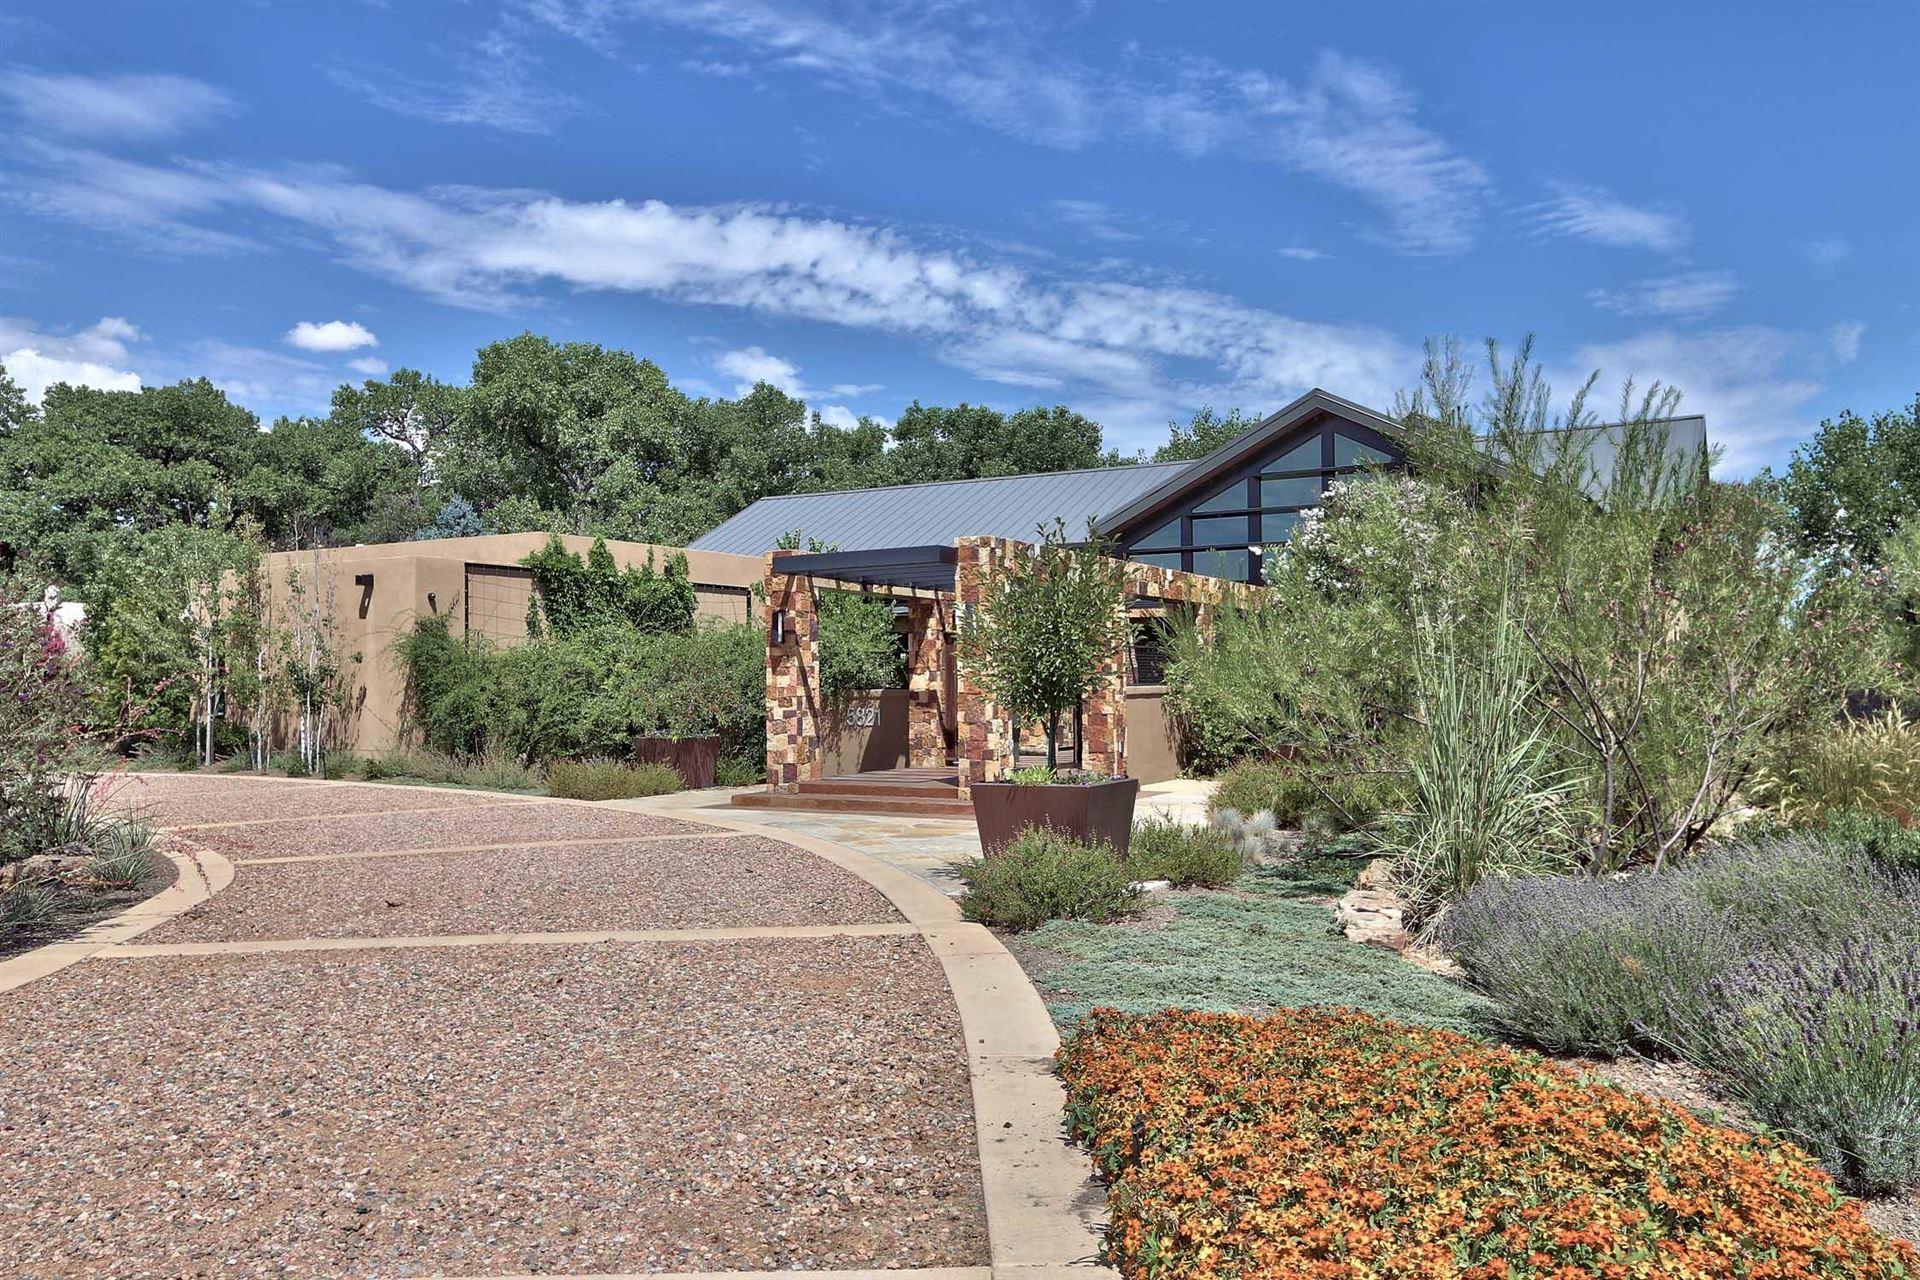 Photo of 5821 PADRE ROBERTO Road NW, Los Ranchos, NM 87107 (MLS # 960795)